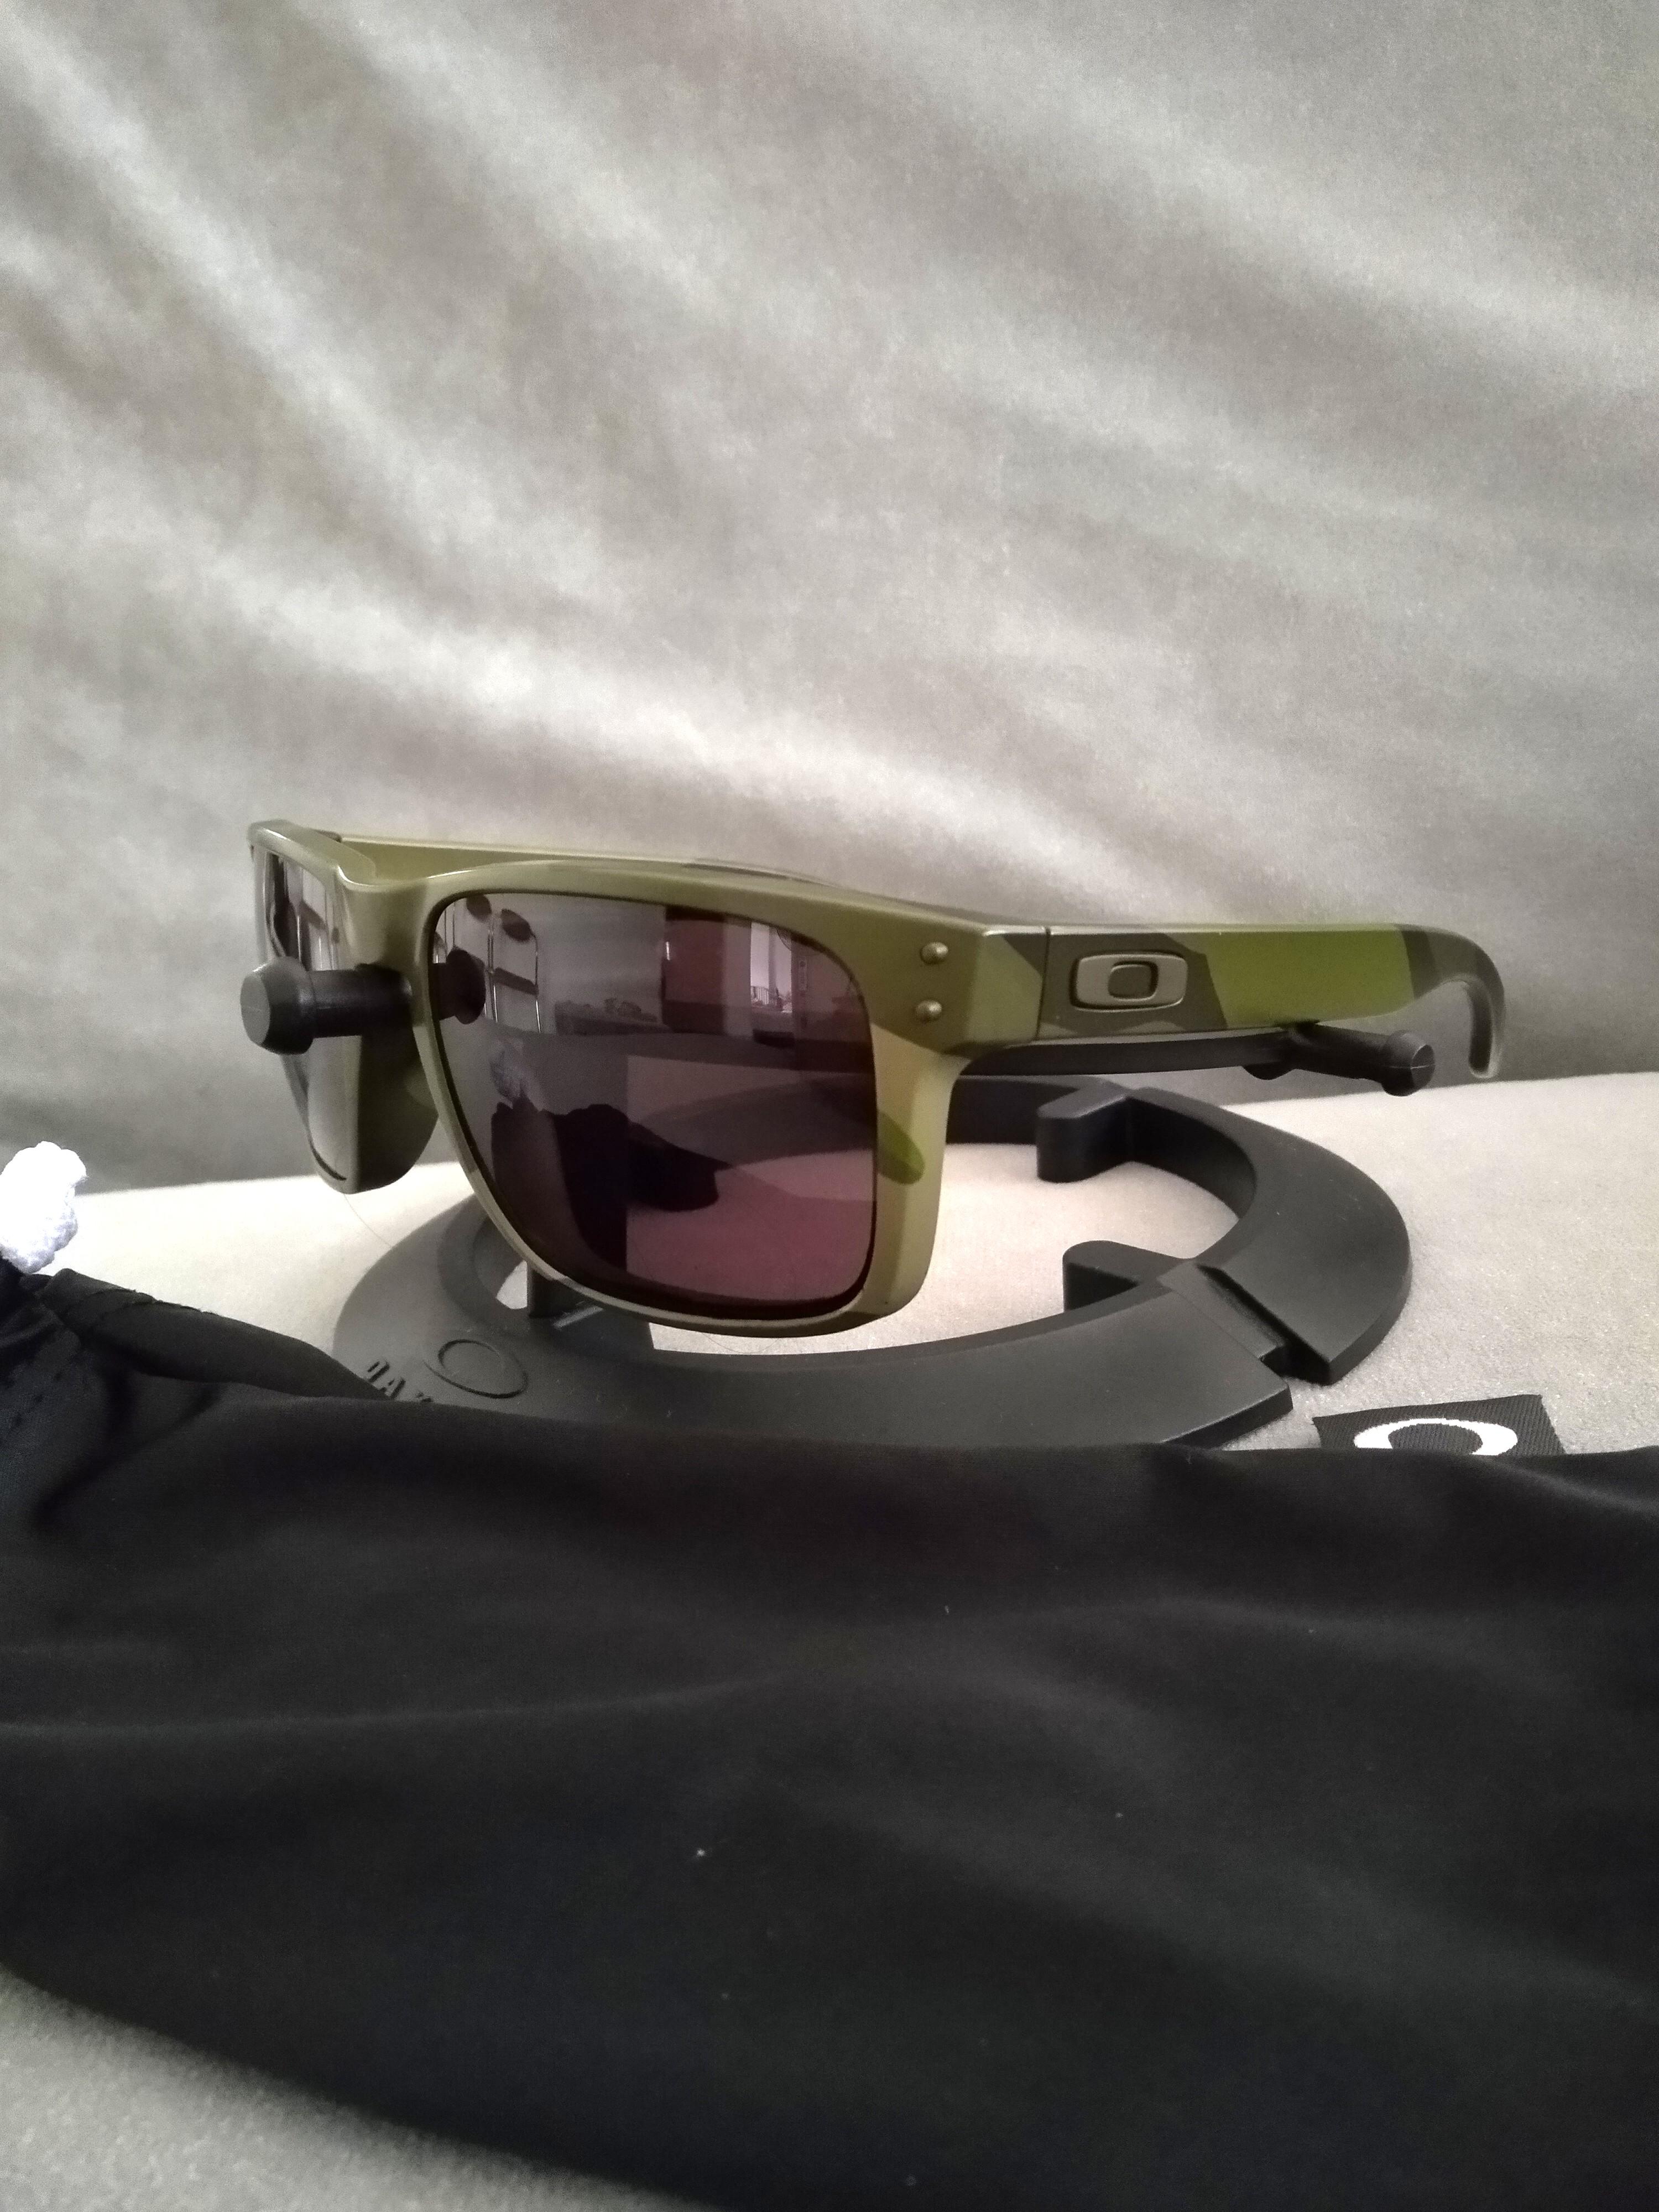 b61674007b Oakley holbrook multicam tropic camo frame grey lens oo9102-b4 ...